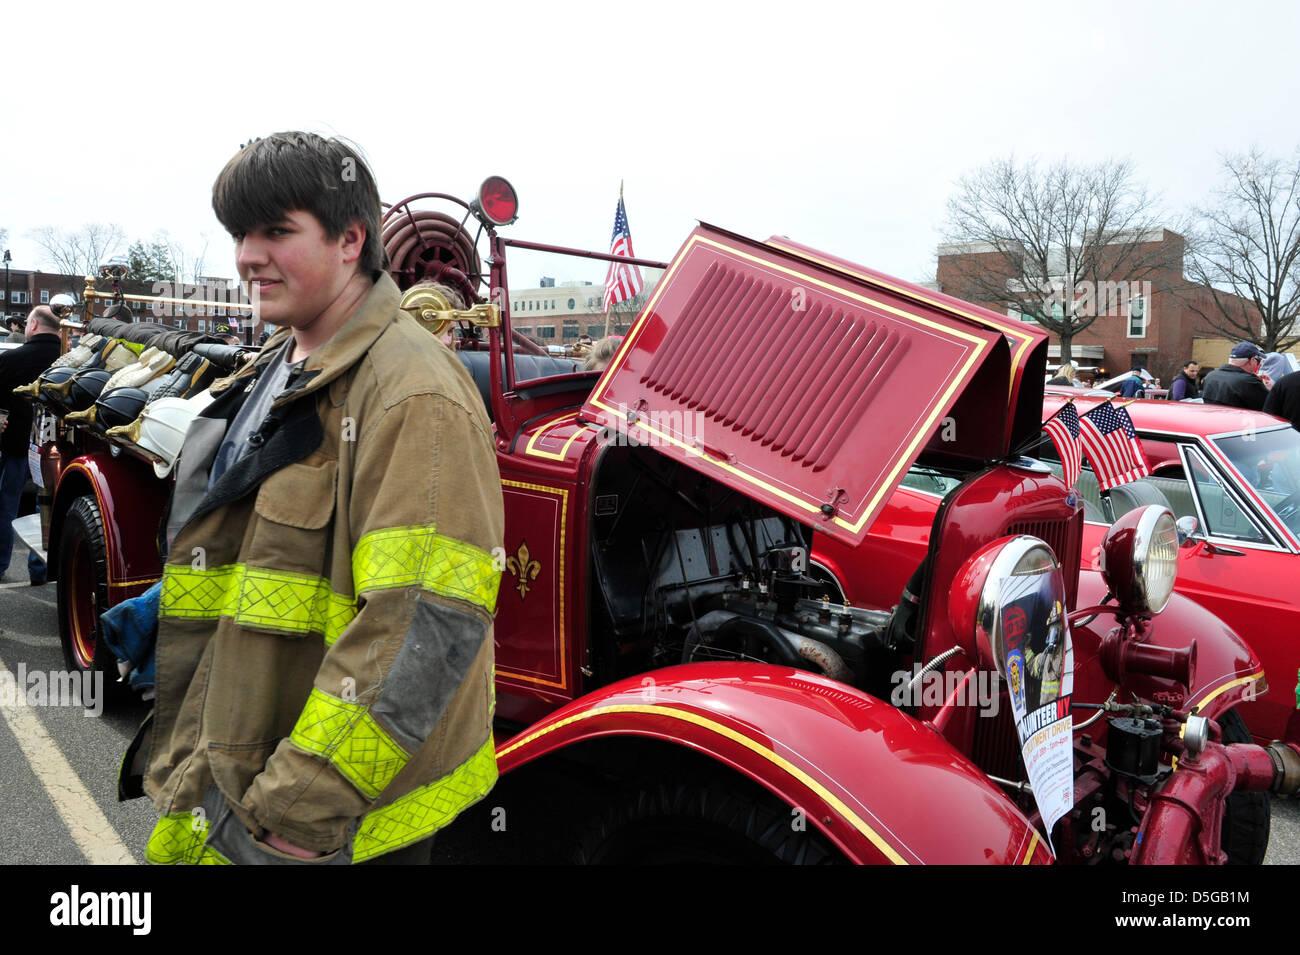 Garden City, New York, U.S. March 31, 2013.  The Garden City Volunteer Exempt Firemans Association brought its 1932 - Stock Image